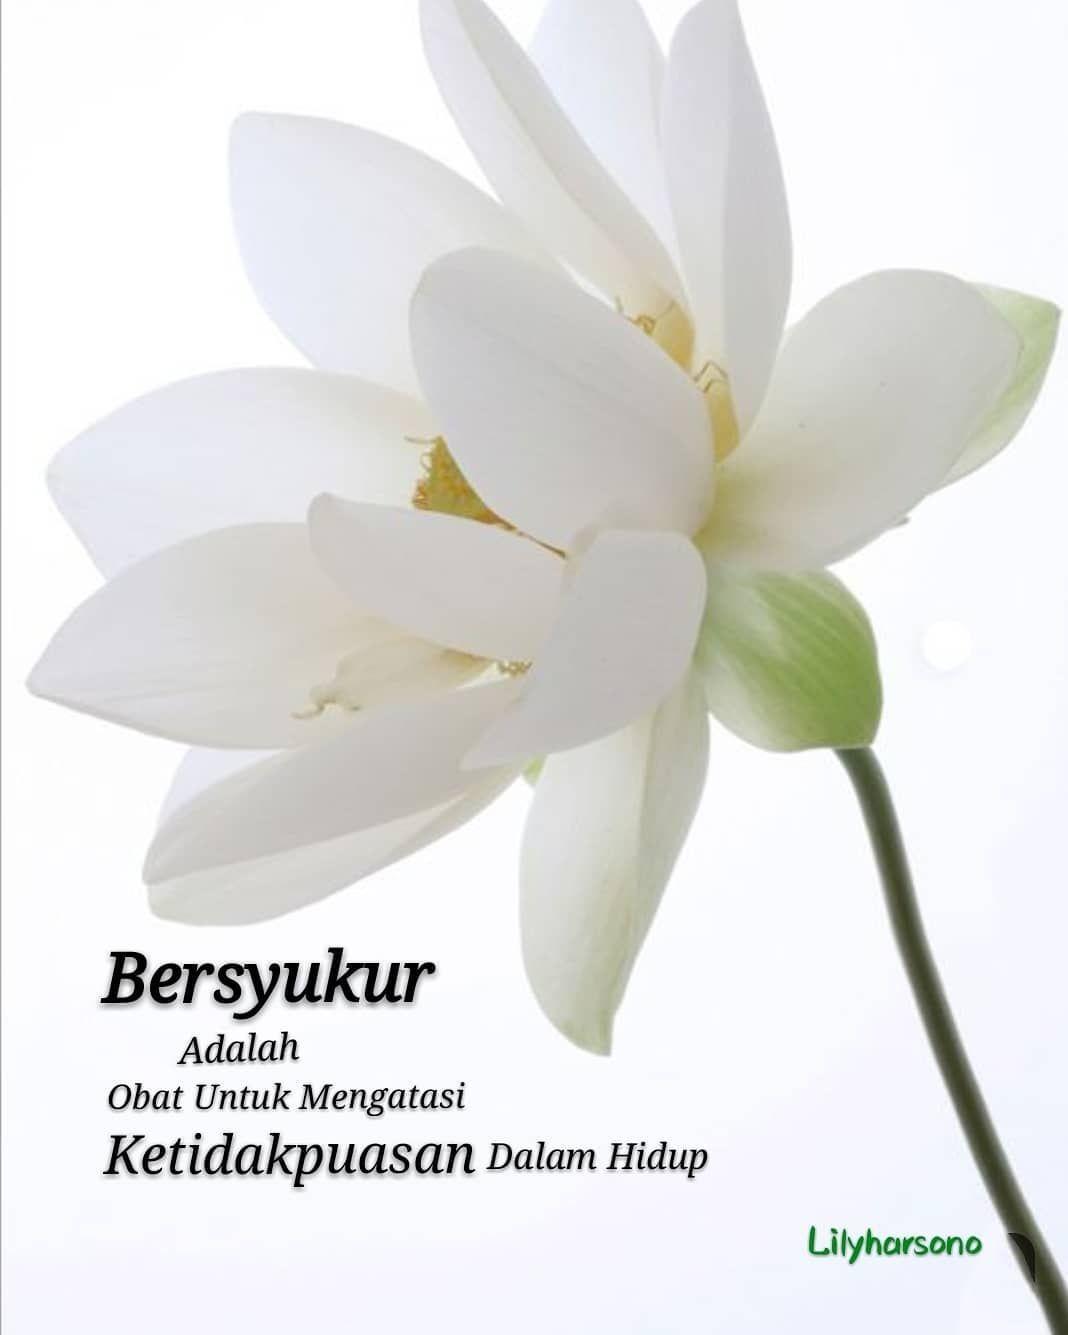 Bersyukur Islamic Inspirational Quotes Good Morning Quotes Islamic Quotes